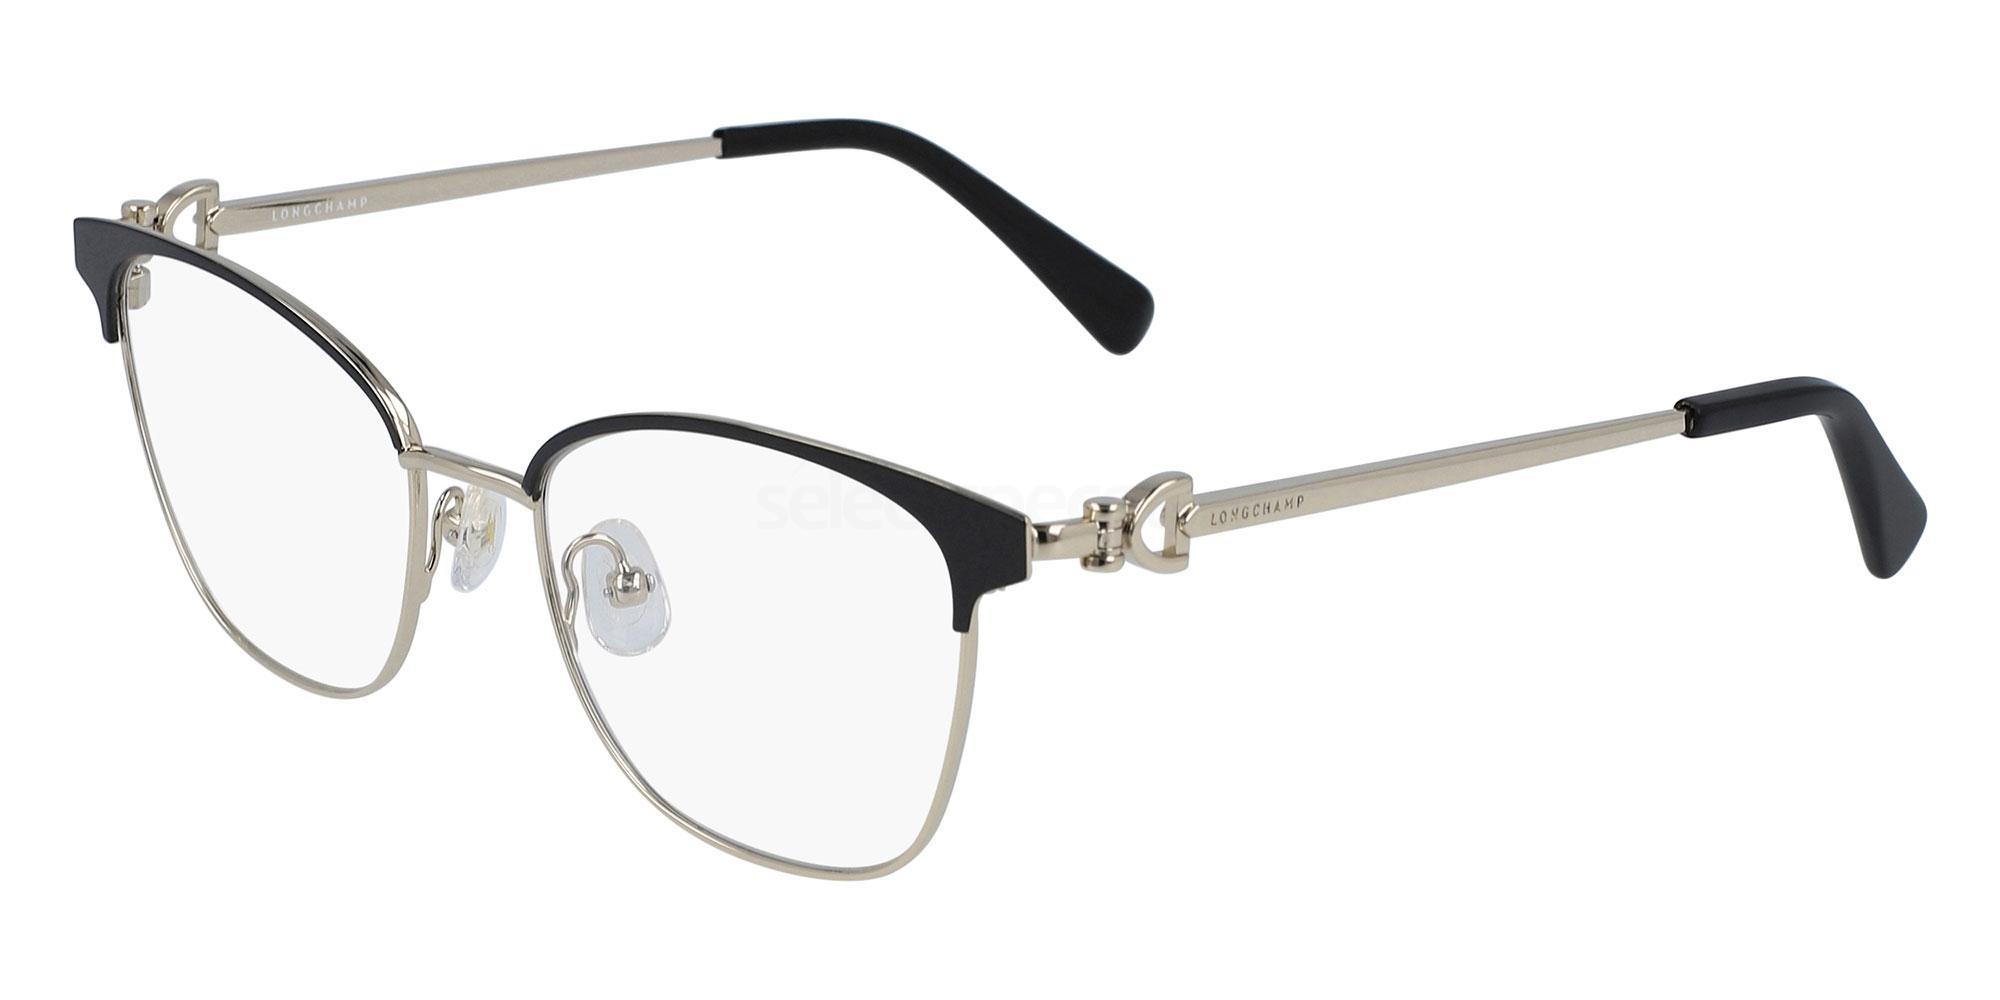 001 LO2111 Glasses, LONGCHAMP